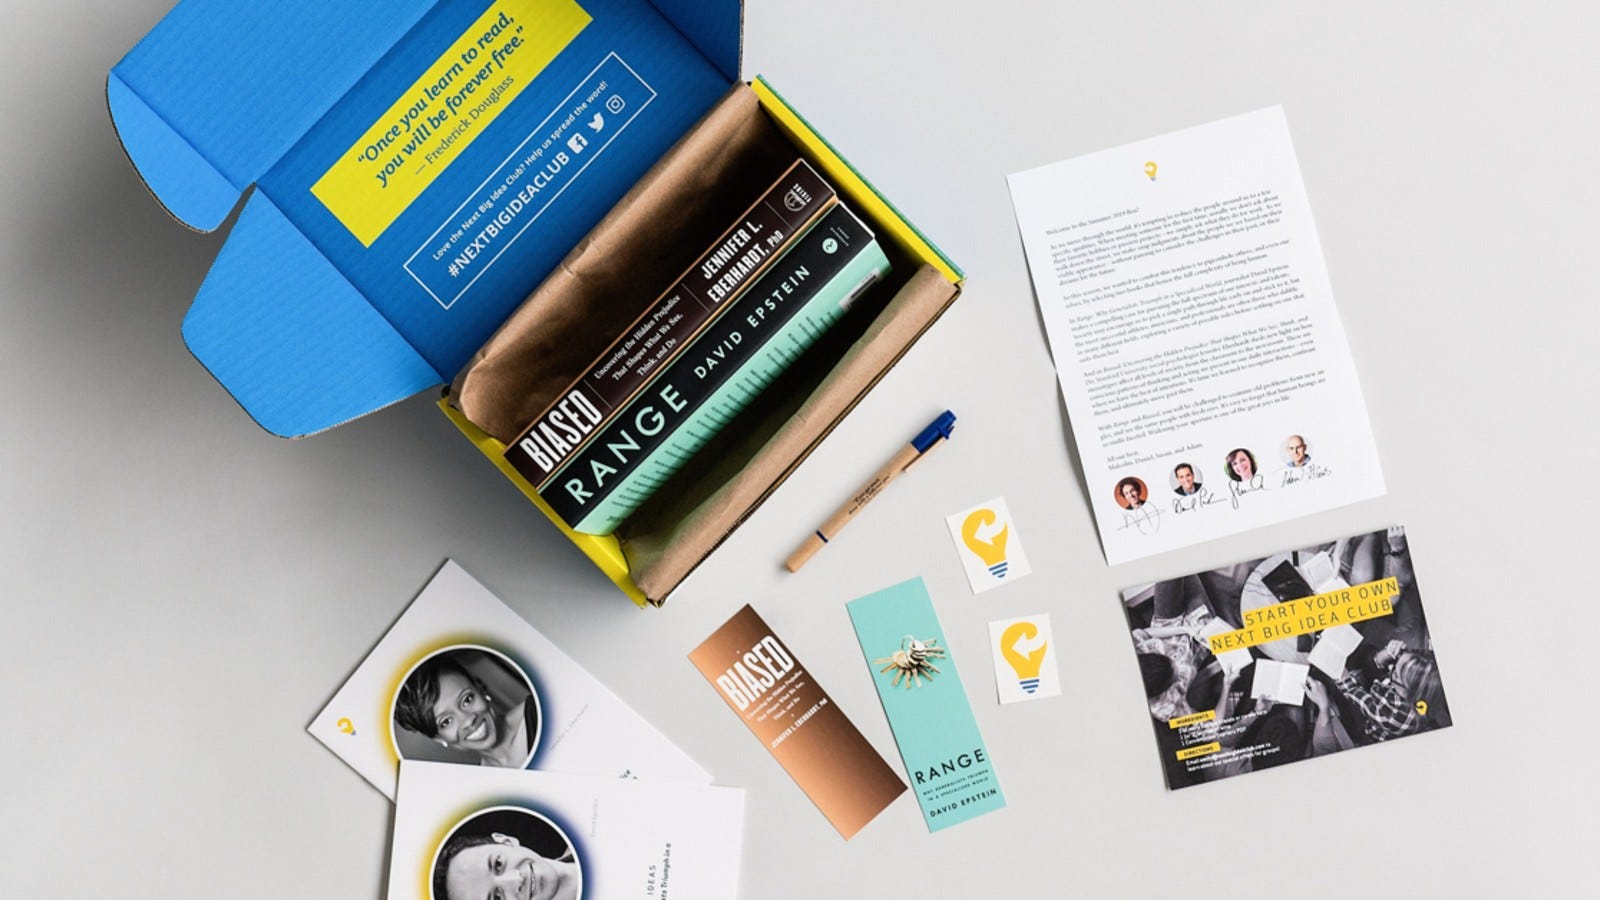 A Next Big Idea Club box featuring two books.